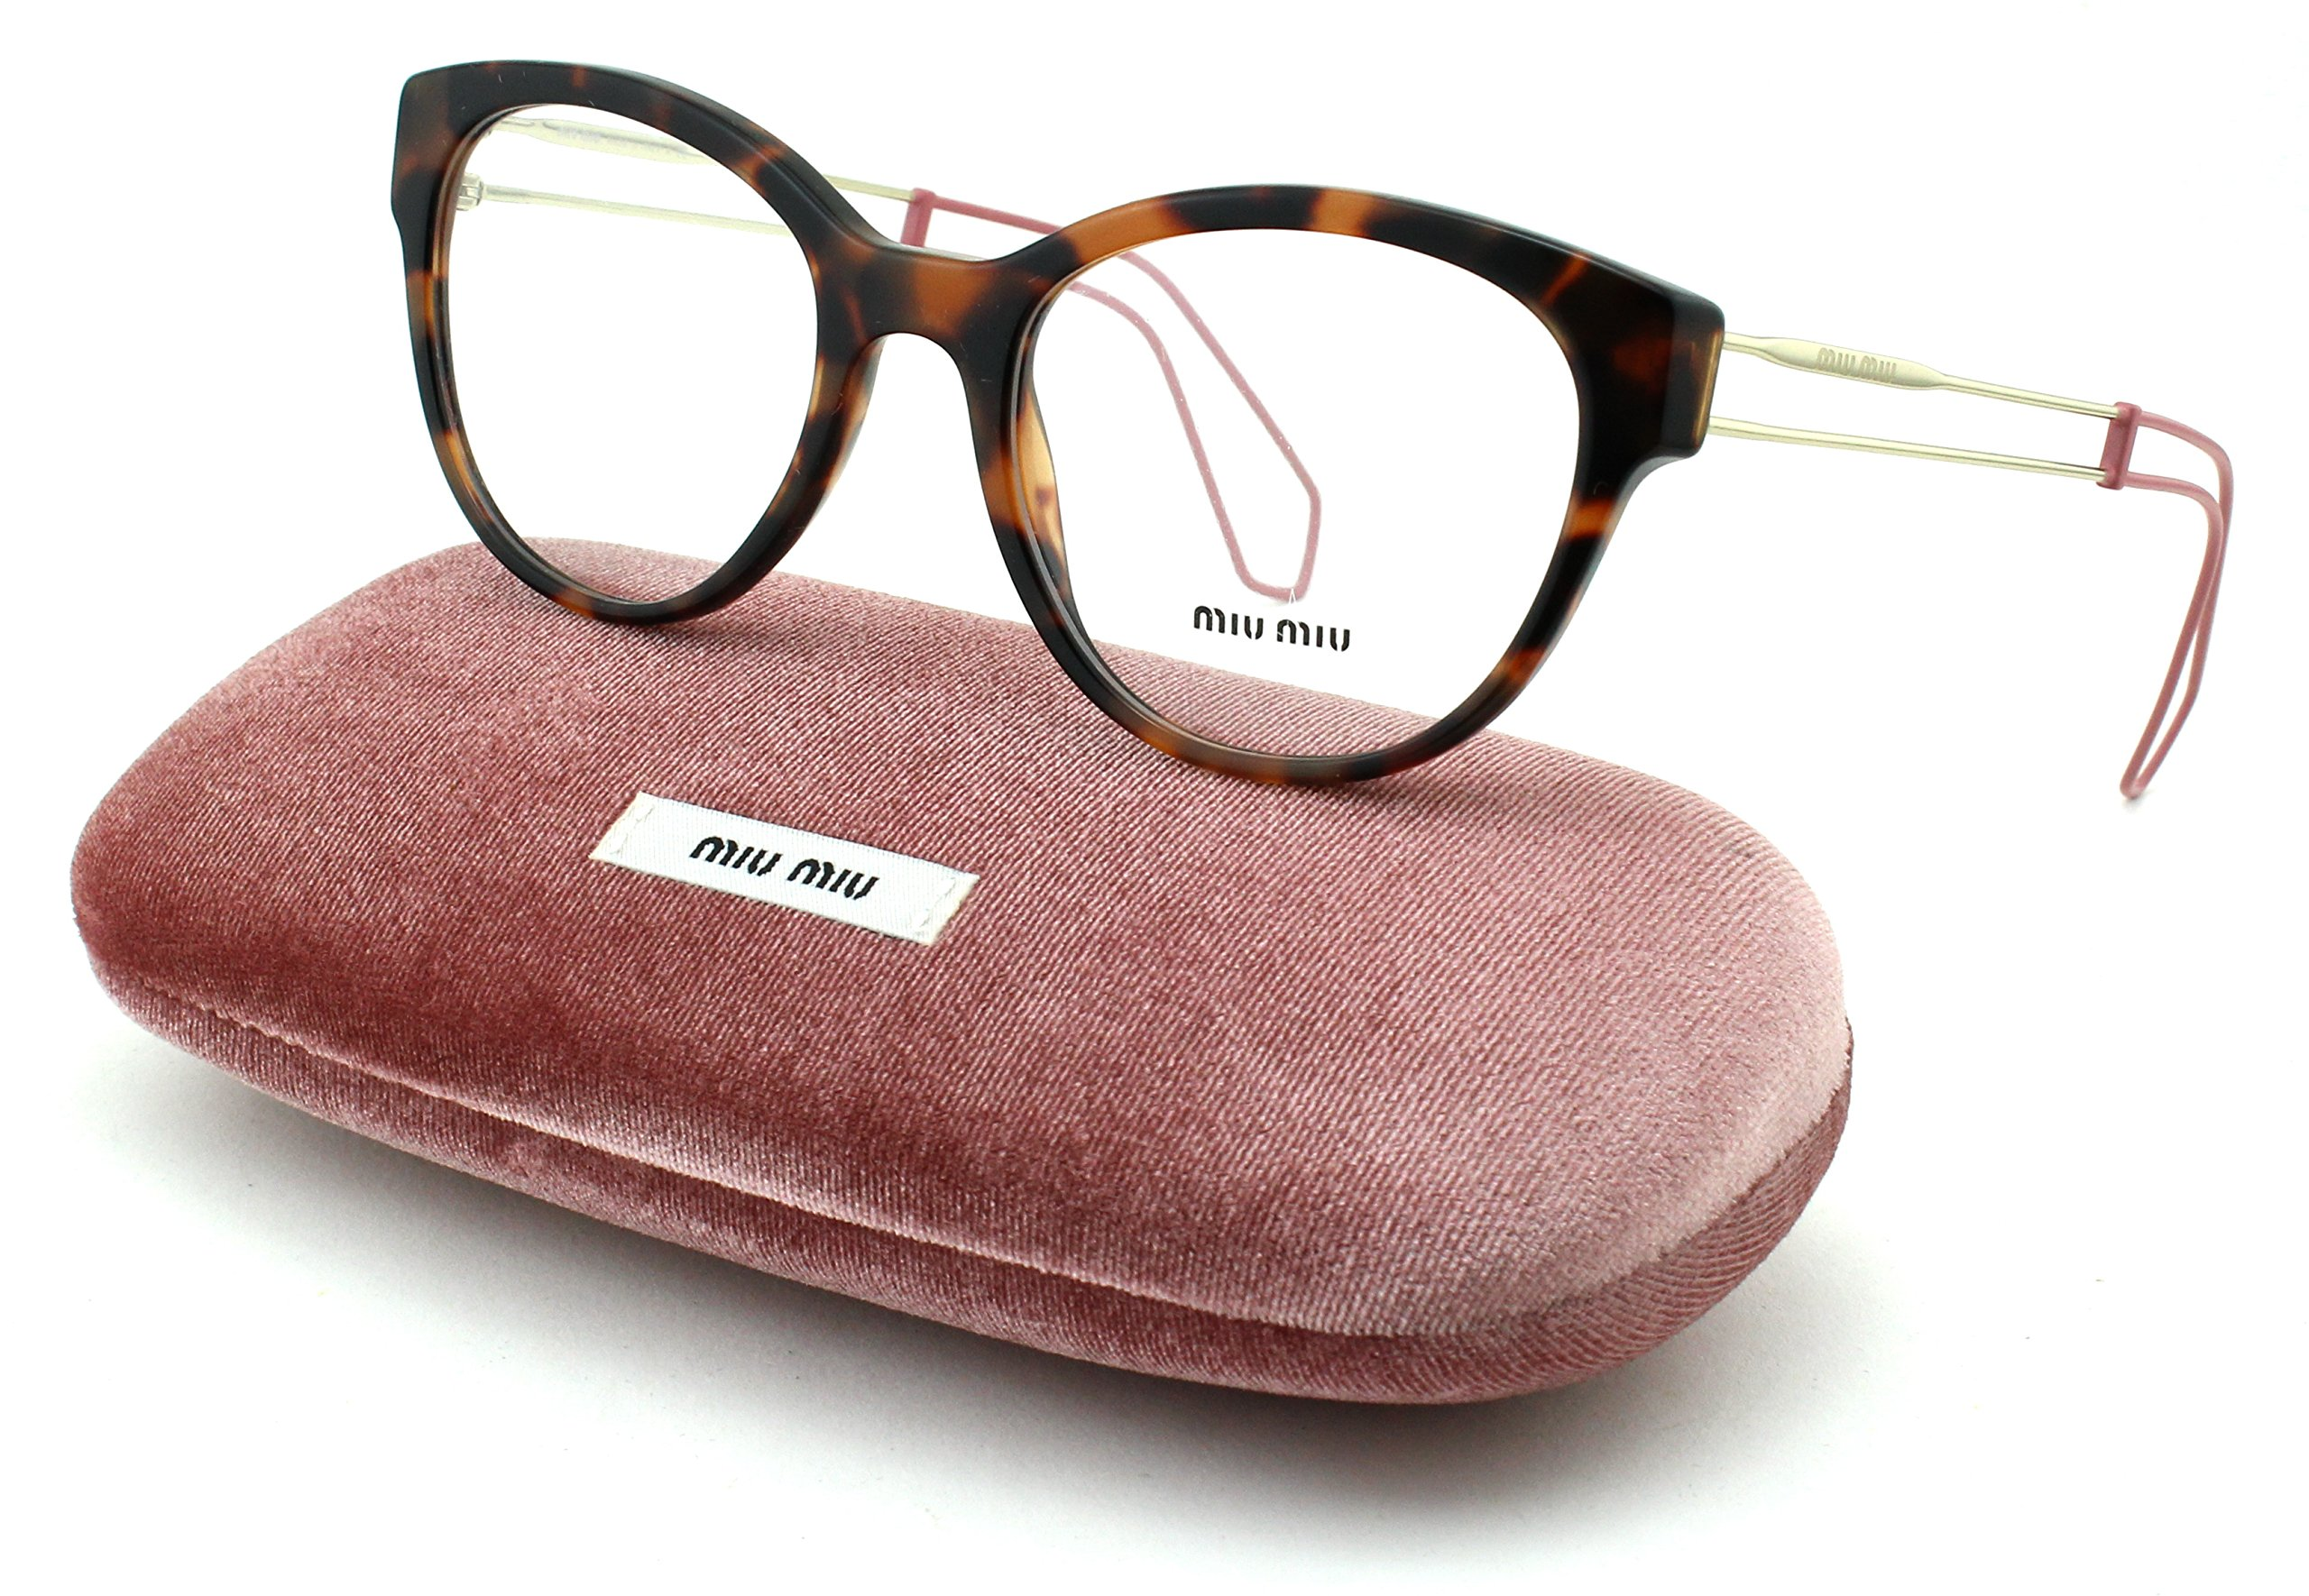 766012734fe5 Miu Miu 03PV Women Round Eyeglasses (Dark Havana Frame USM 1O1